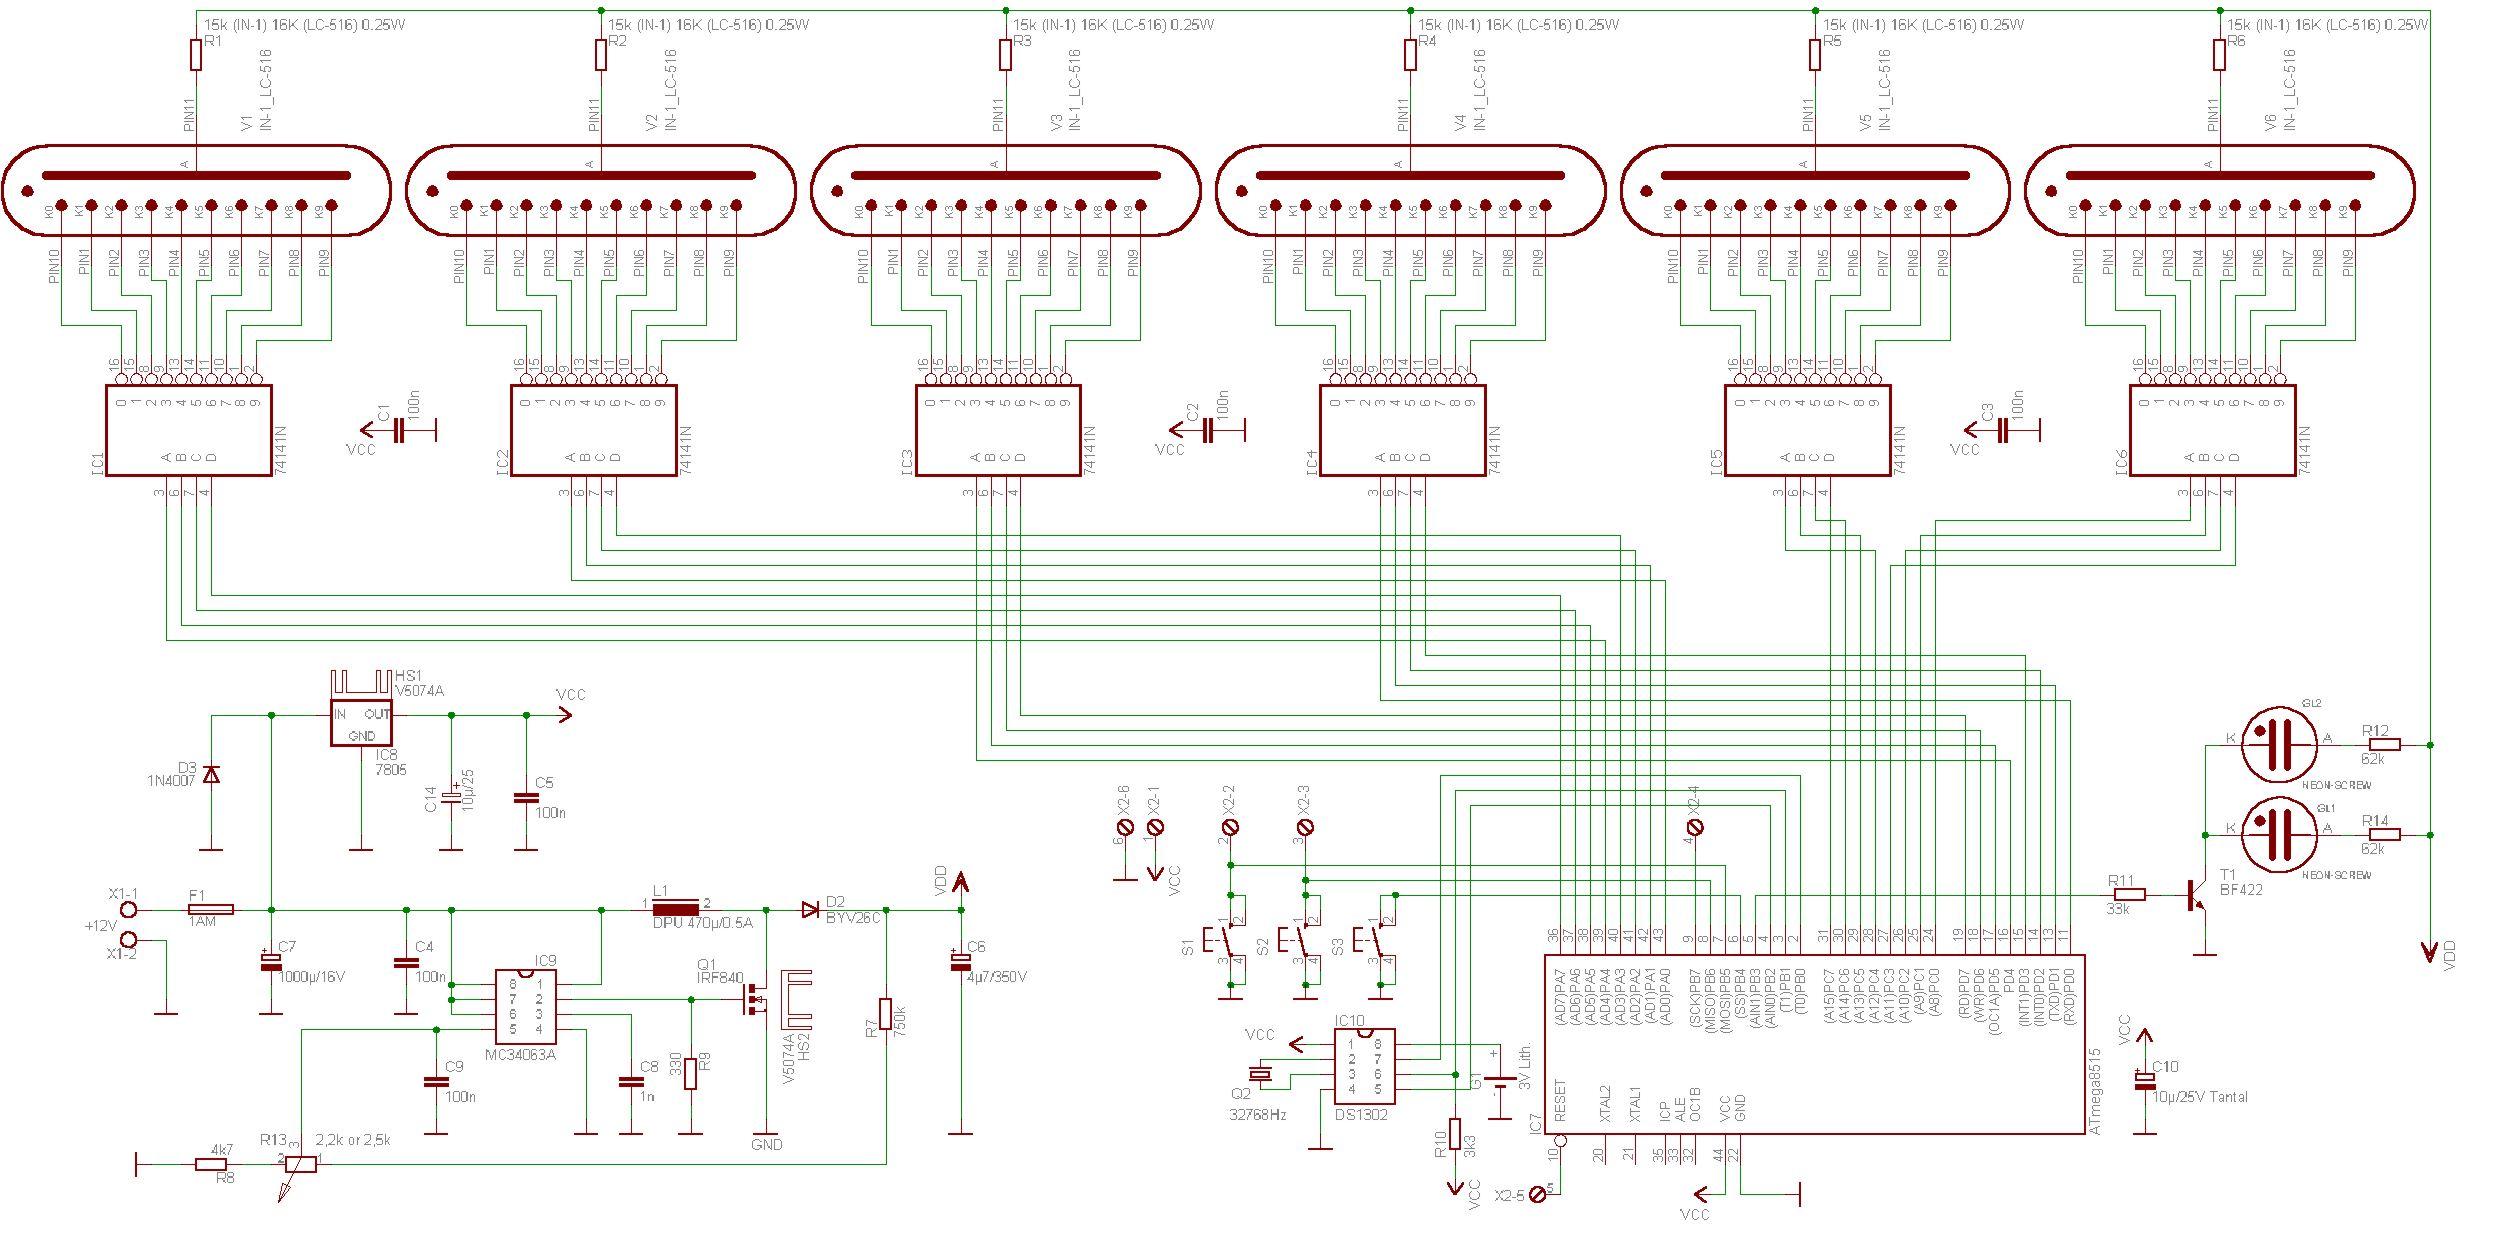 Modular Jack Wiring Diagram Auto Electrical Rj22 Nixie Tube Power Supply Schematic